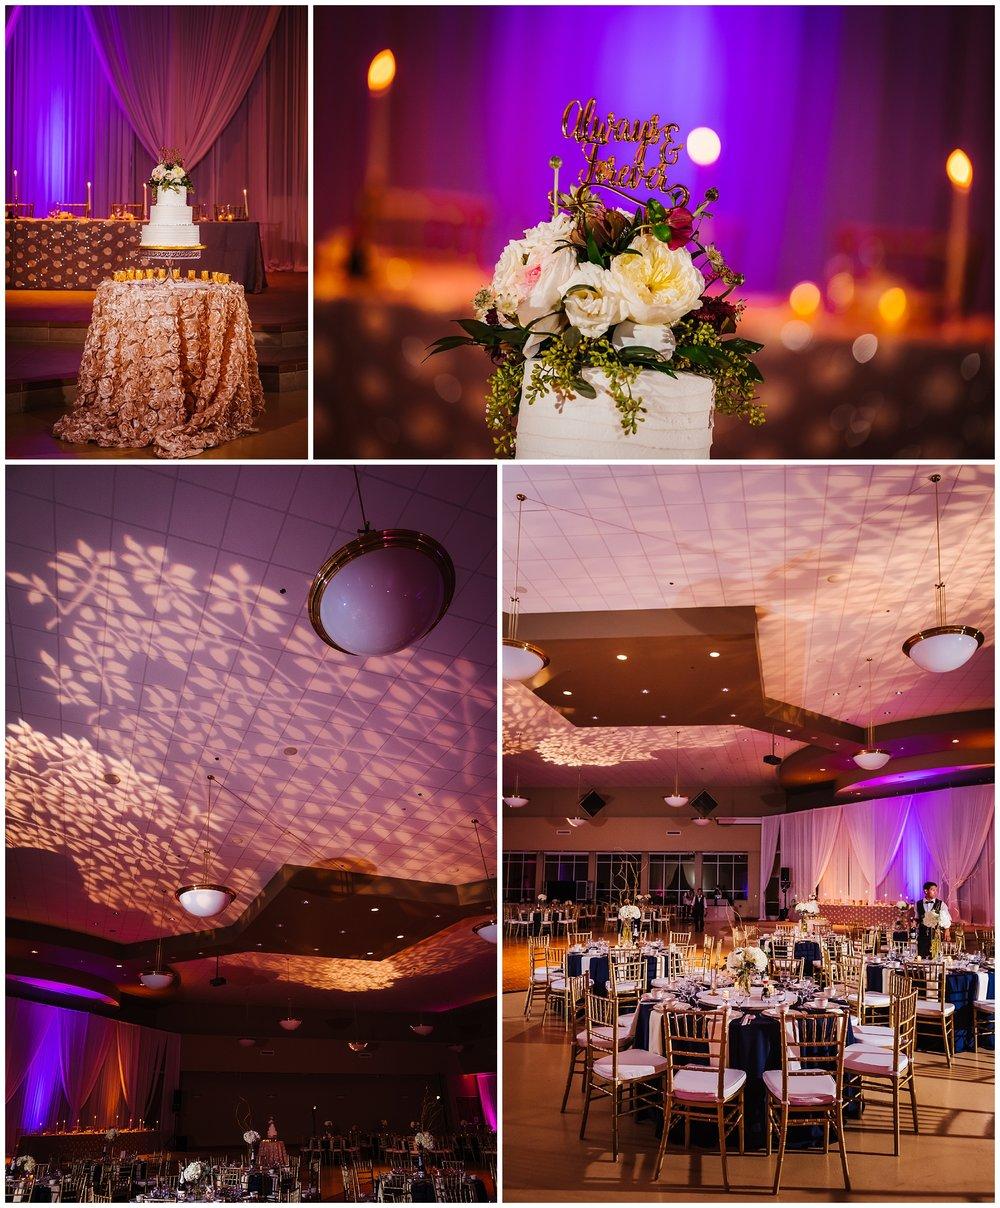 tampa-wedding-photographer-philipino-colorful-woods-ballroom-church-mass-confetti-fuscia_0061.jpg